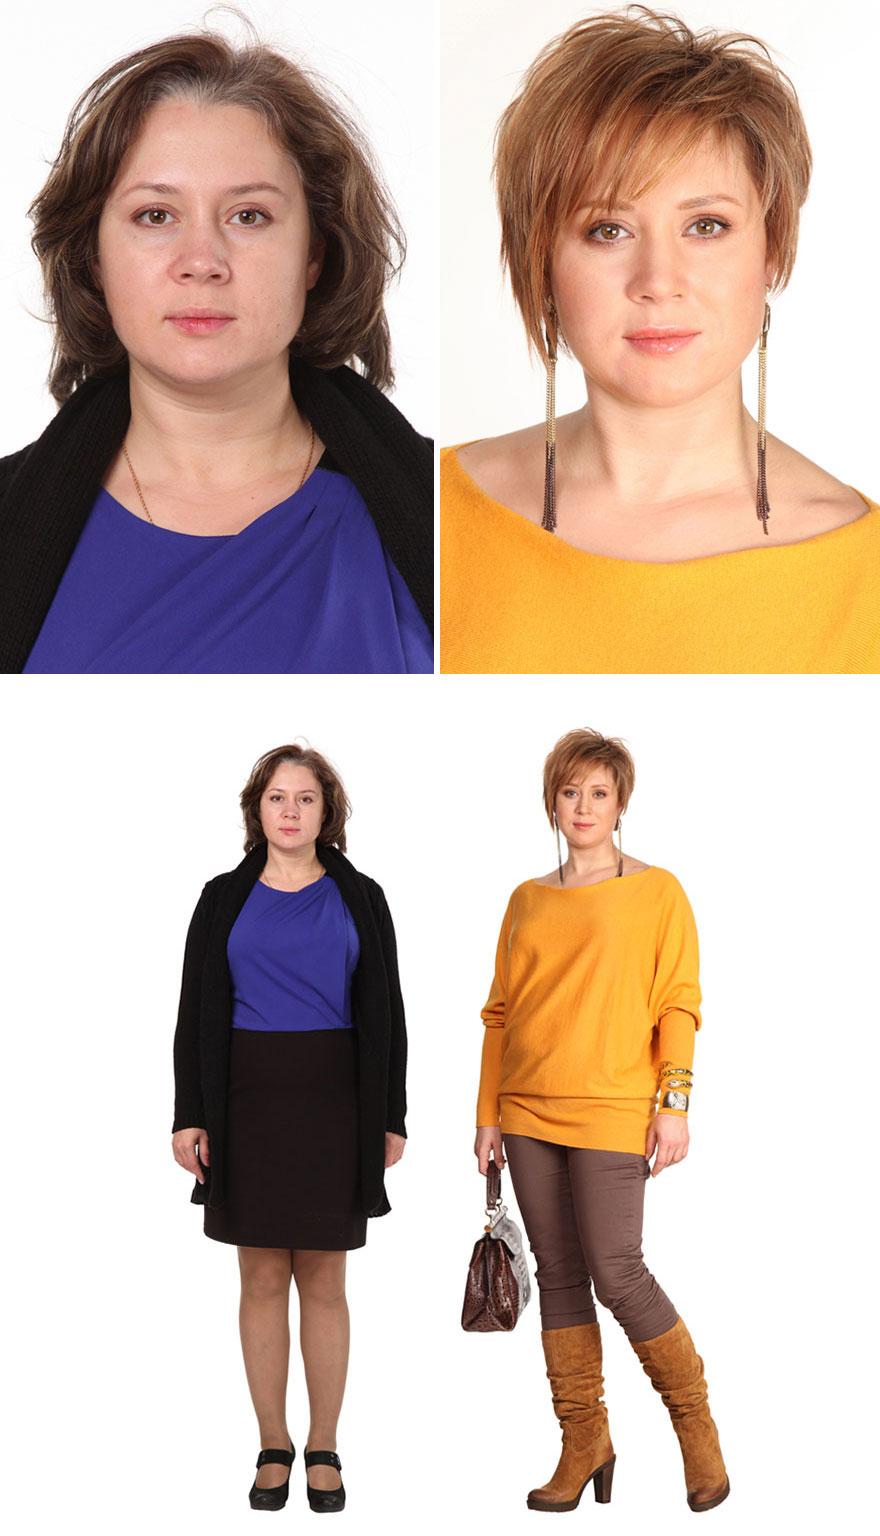 before-after-makeup-woman-style-change-konstantin-bogomolov-7